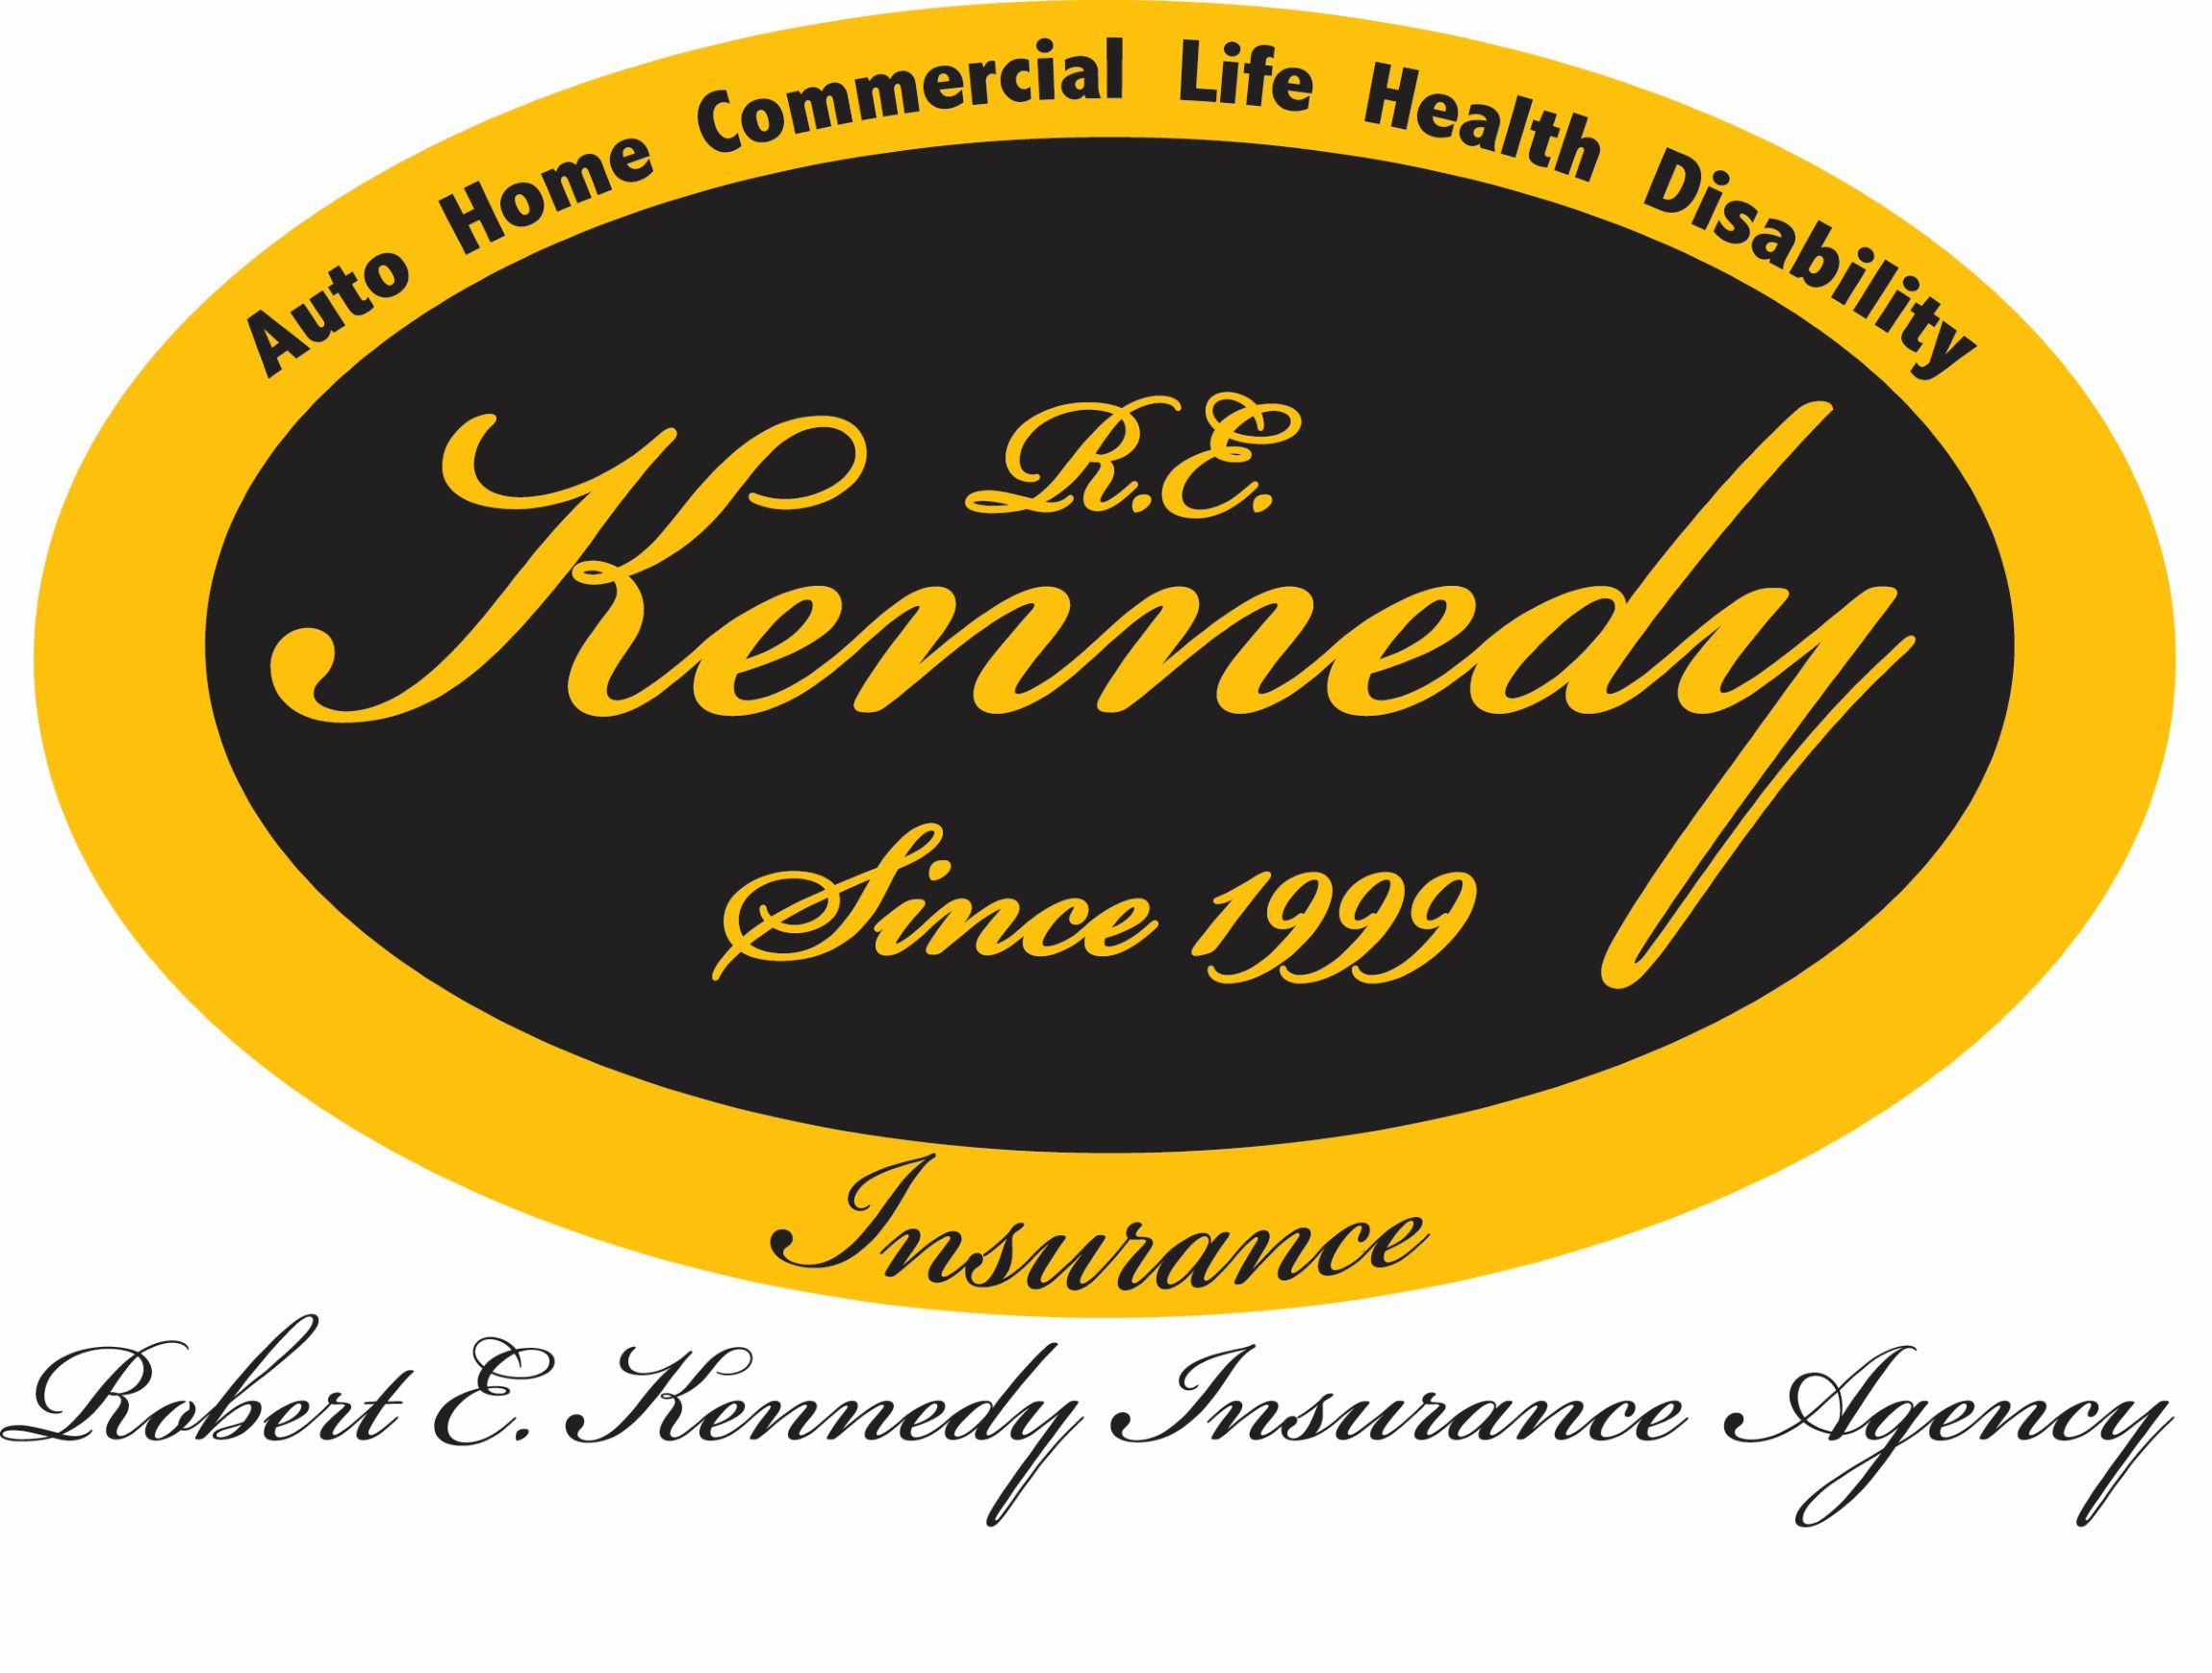 Robert E Kennedy Insurance Agency